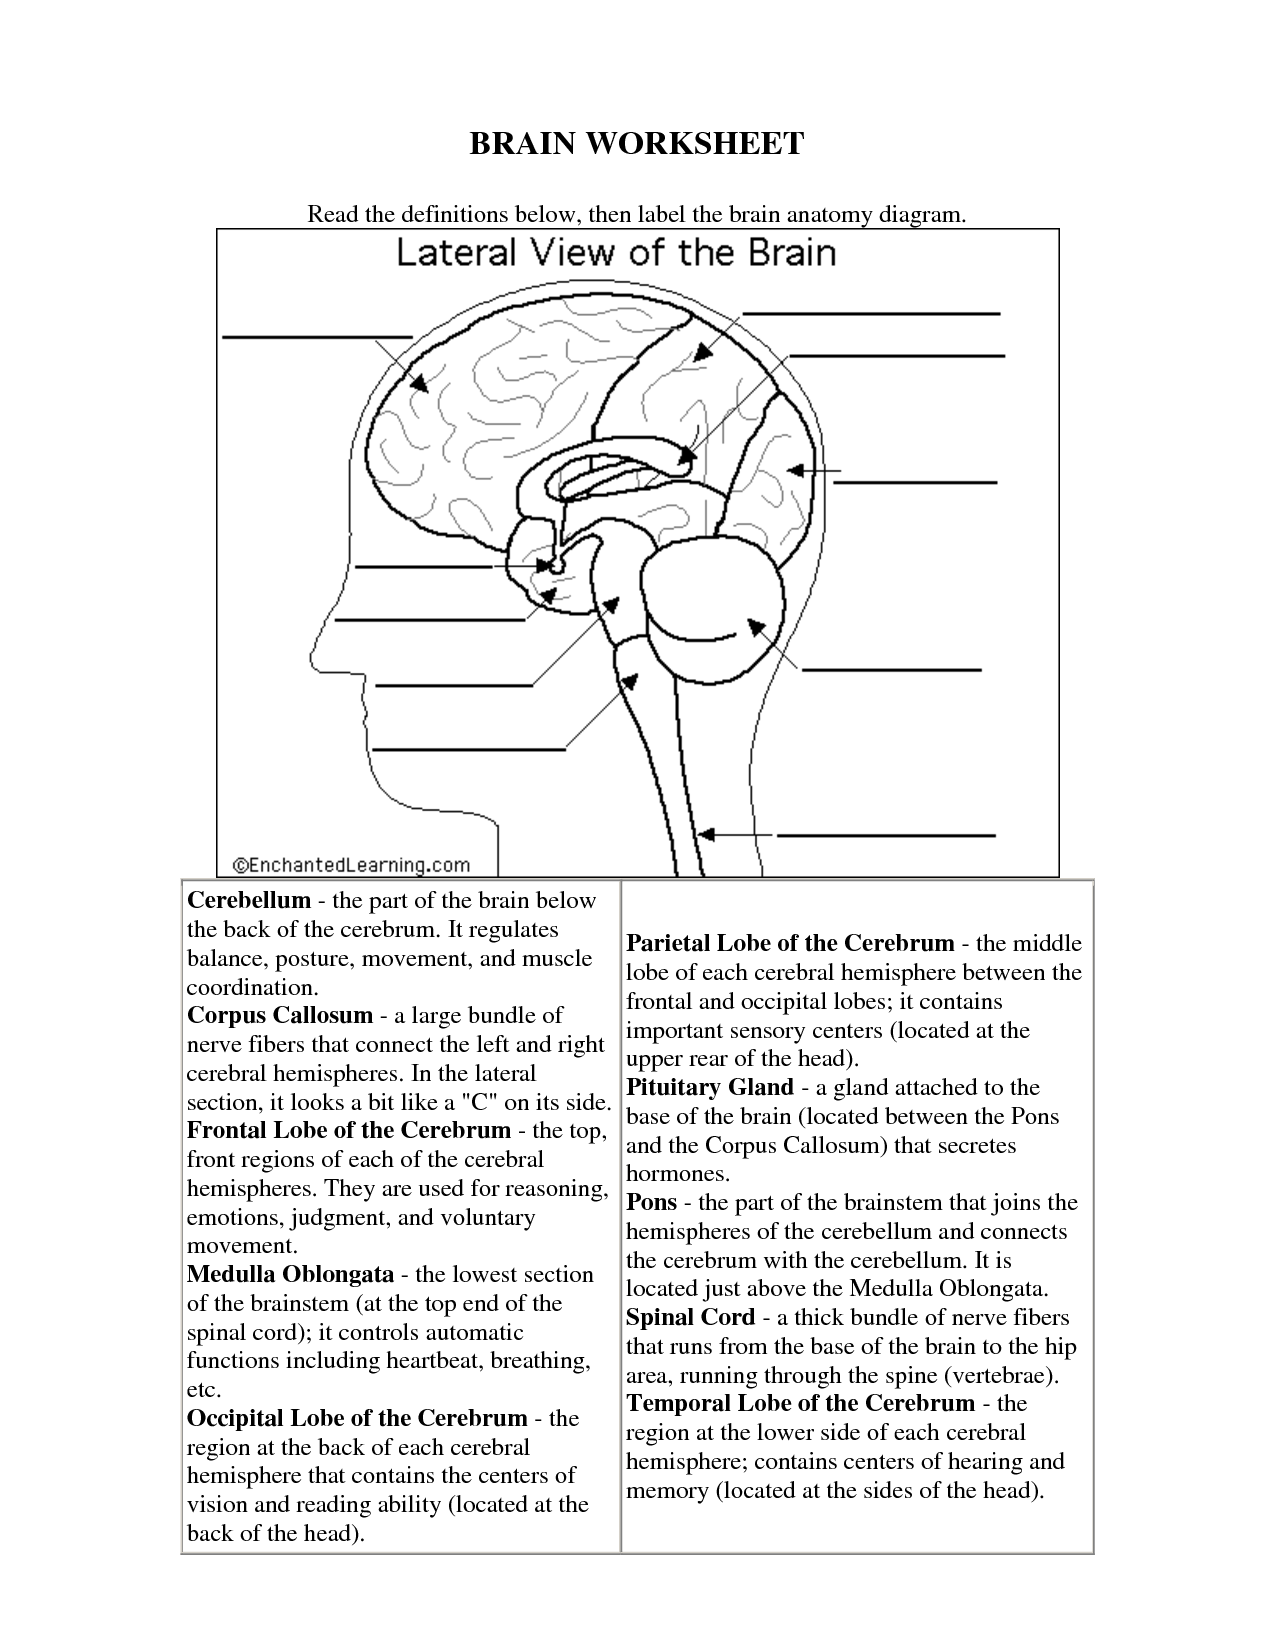 fish diagram medical worksheet 2005 ford focus headlight wiring labeling preschool best free